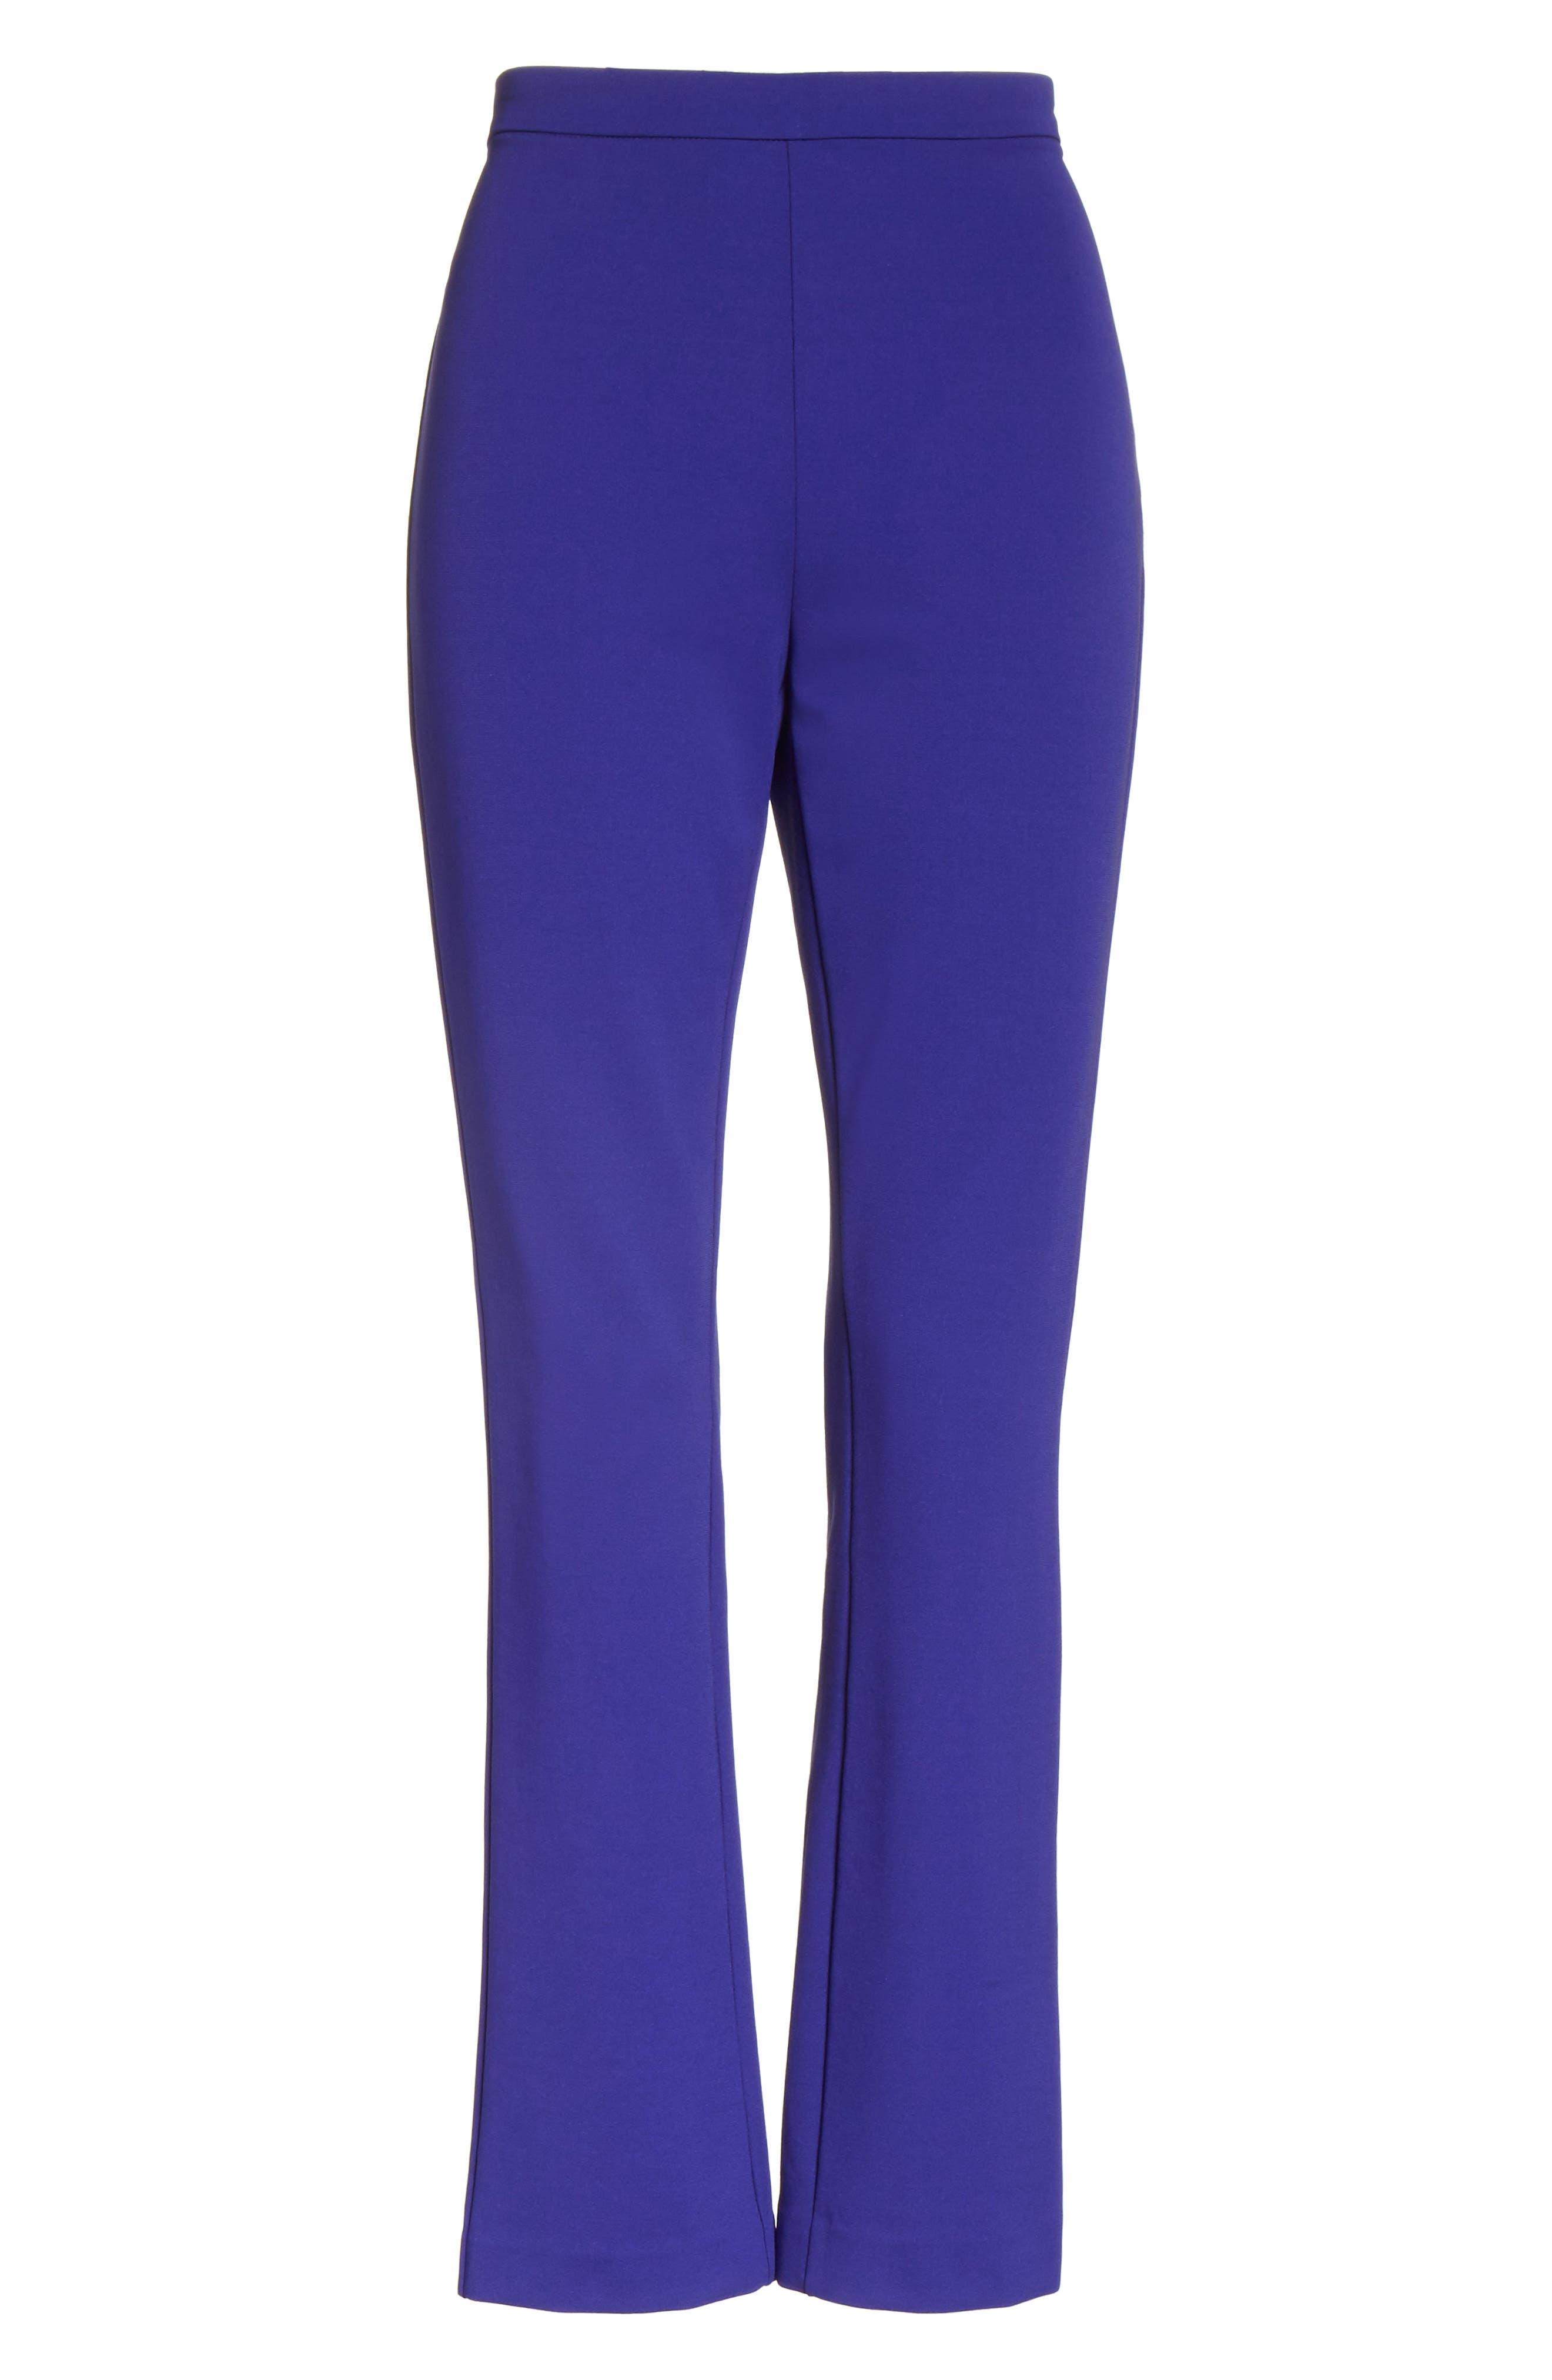 Calerno Crepe Crop Trousers,                             Alternate thumbnail 6, color,                             Violet